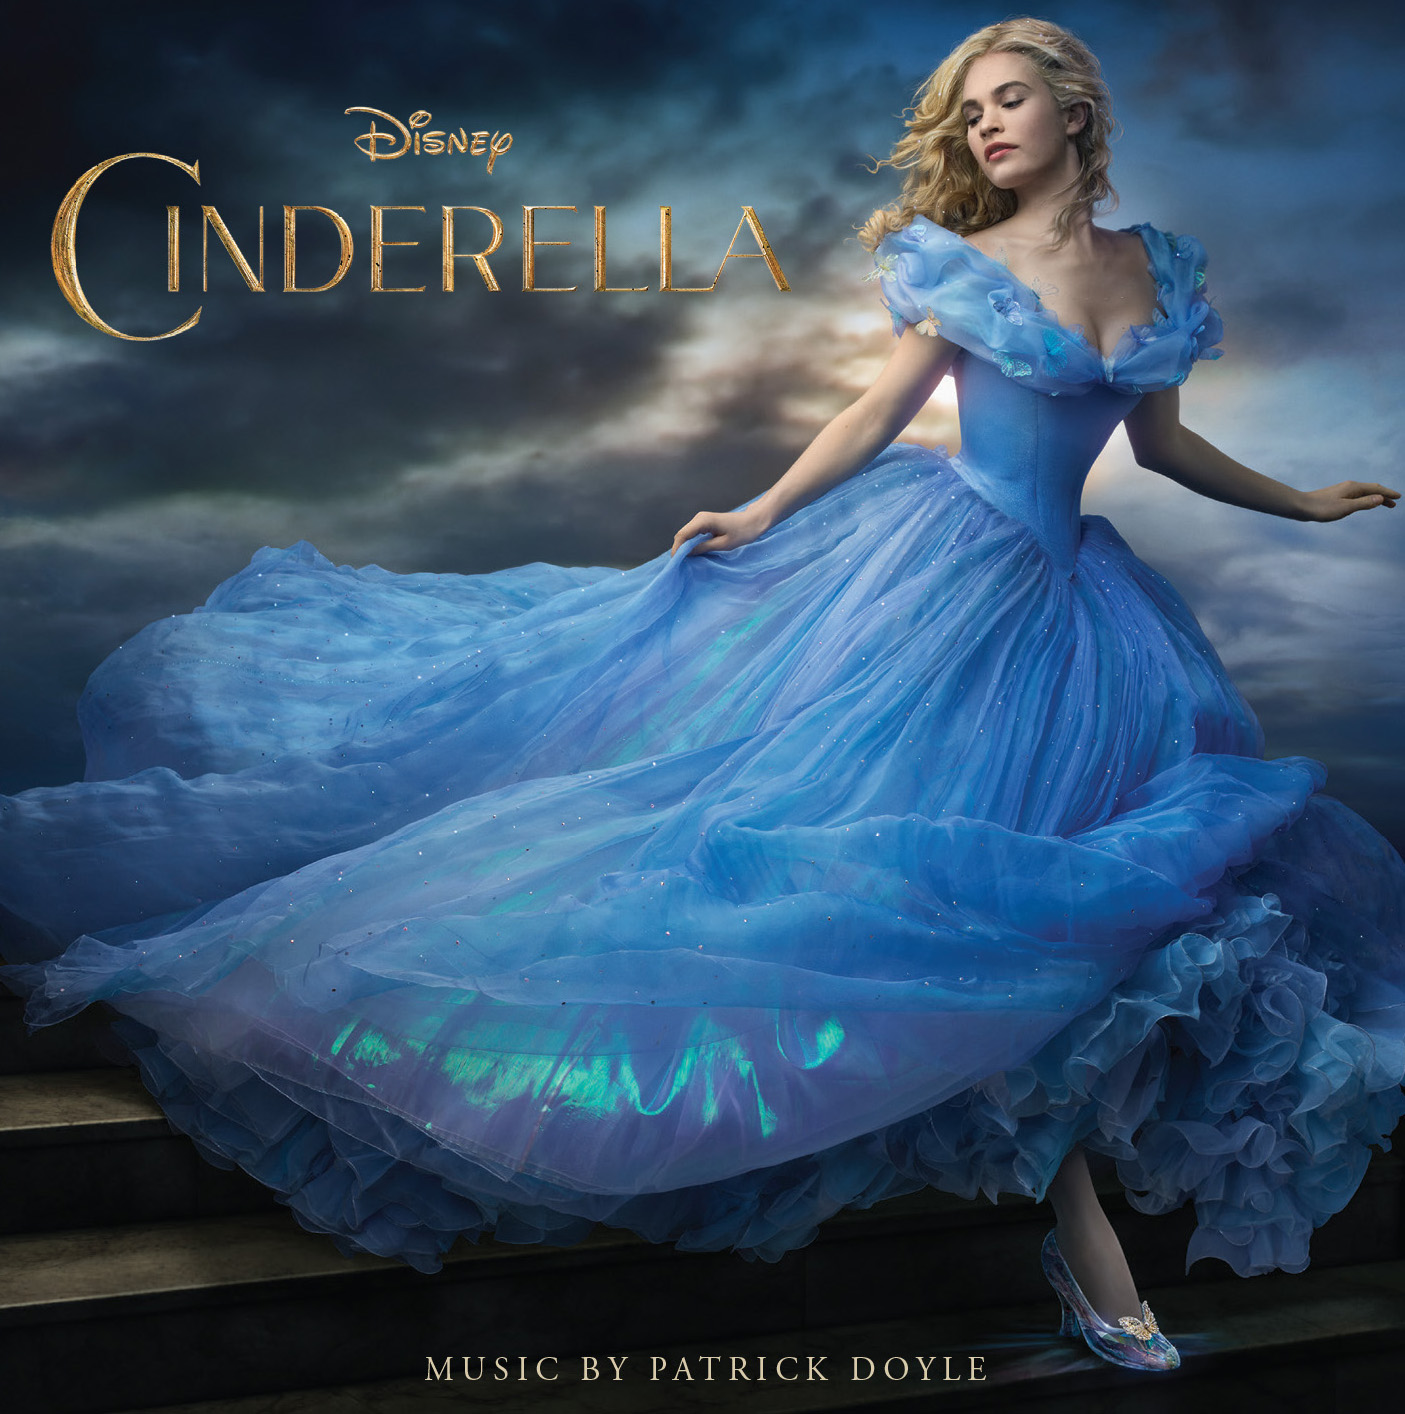 Music Mini Review : OST Cinderella de Patrick Doyle (Walt Disney Records)